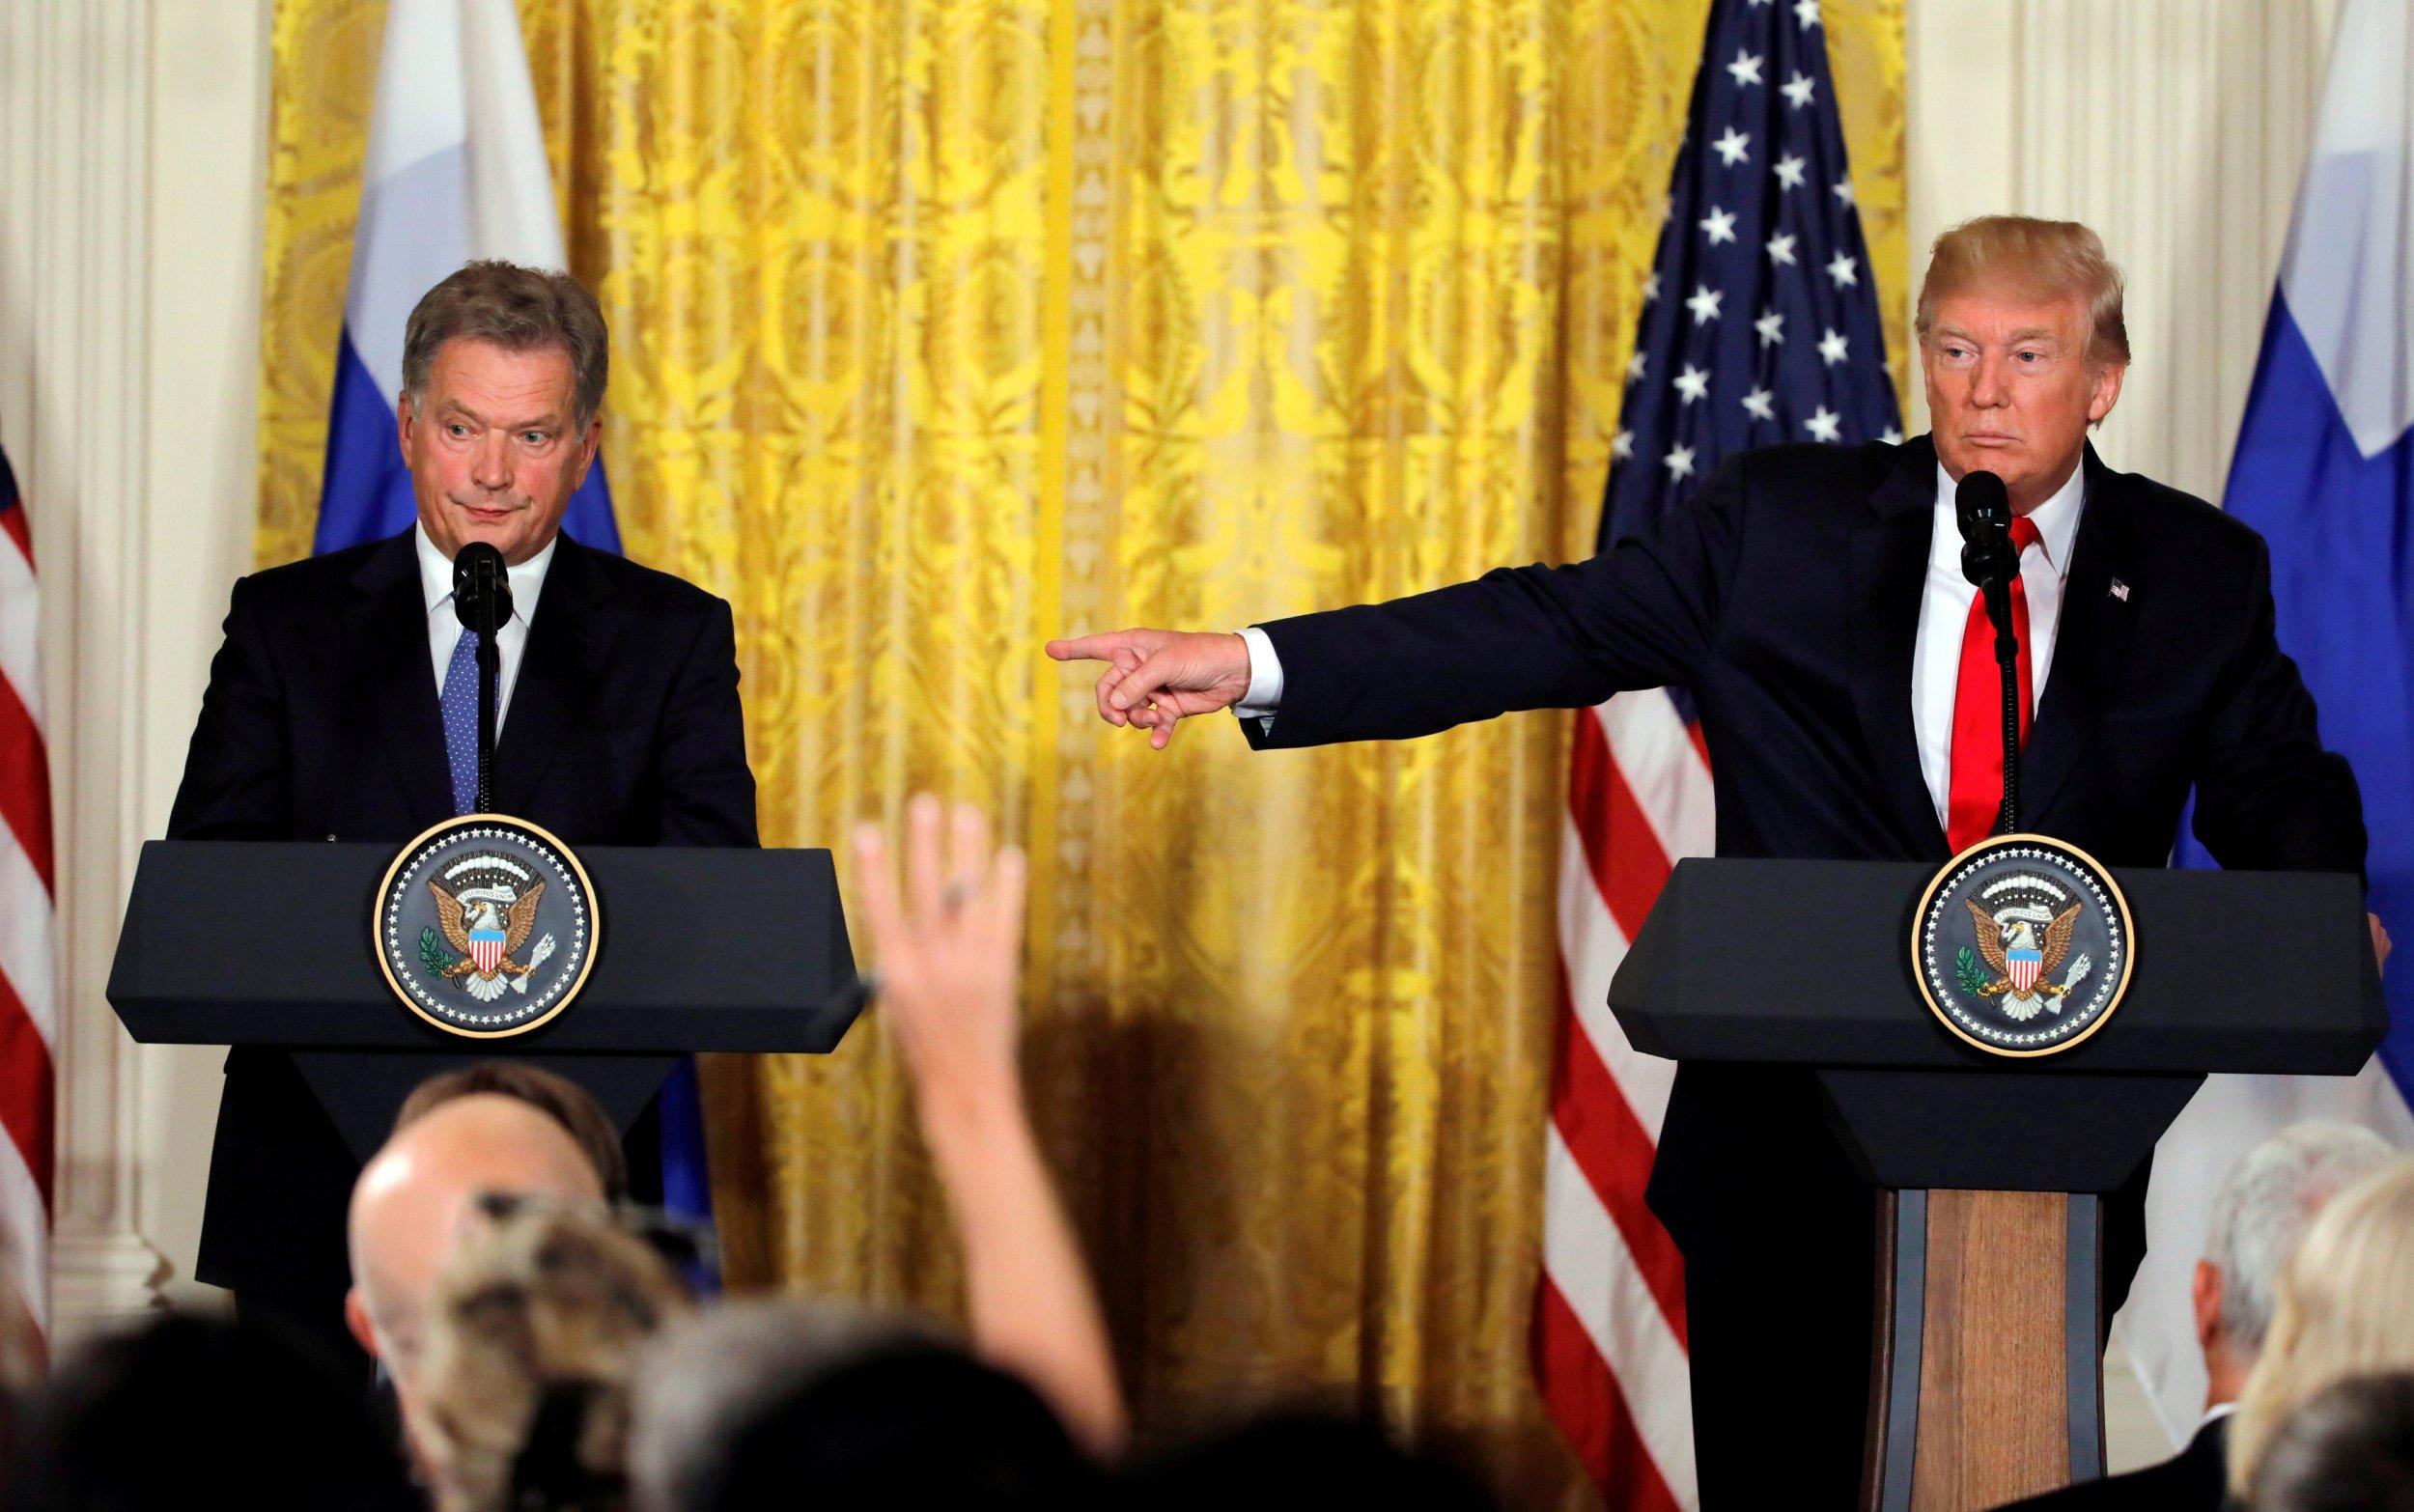 Donald Trump and Sauli Niinisto